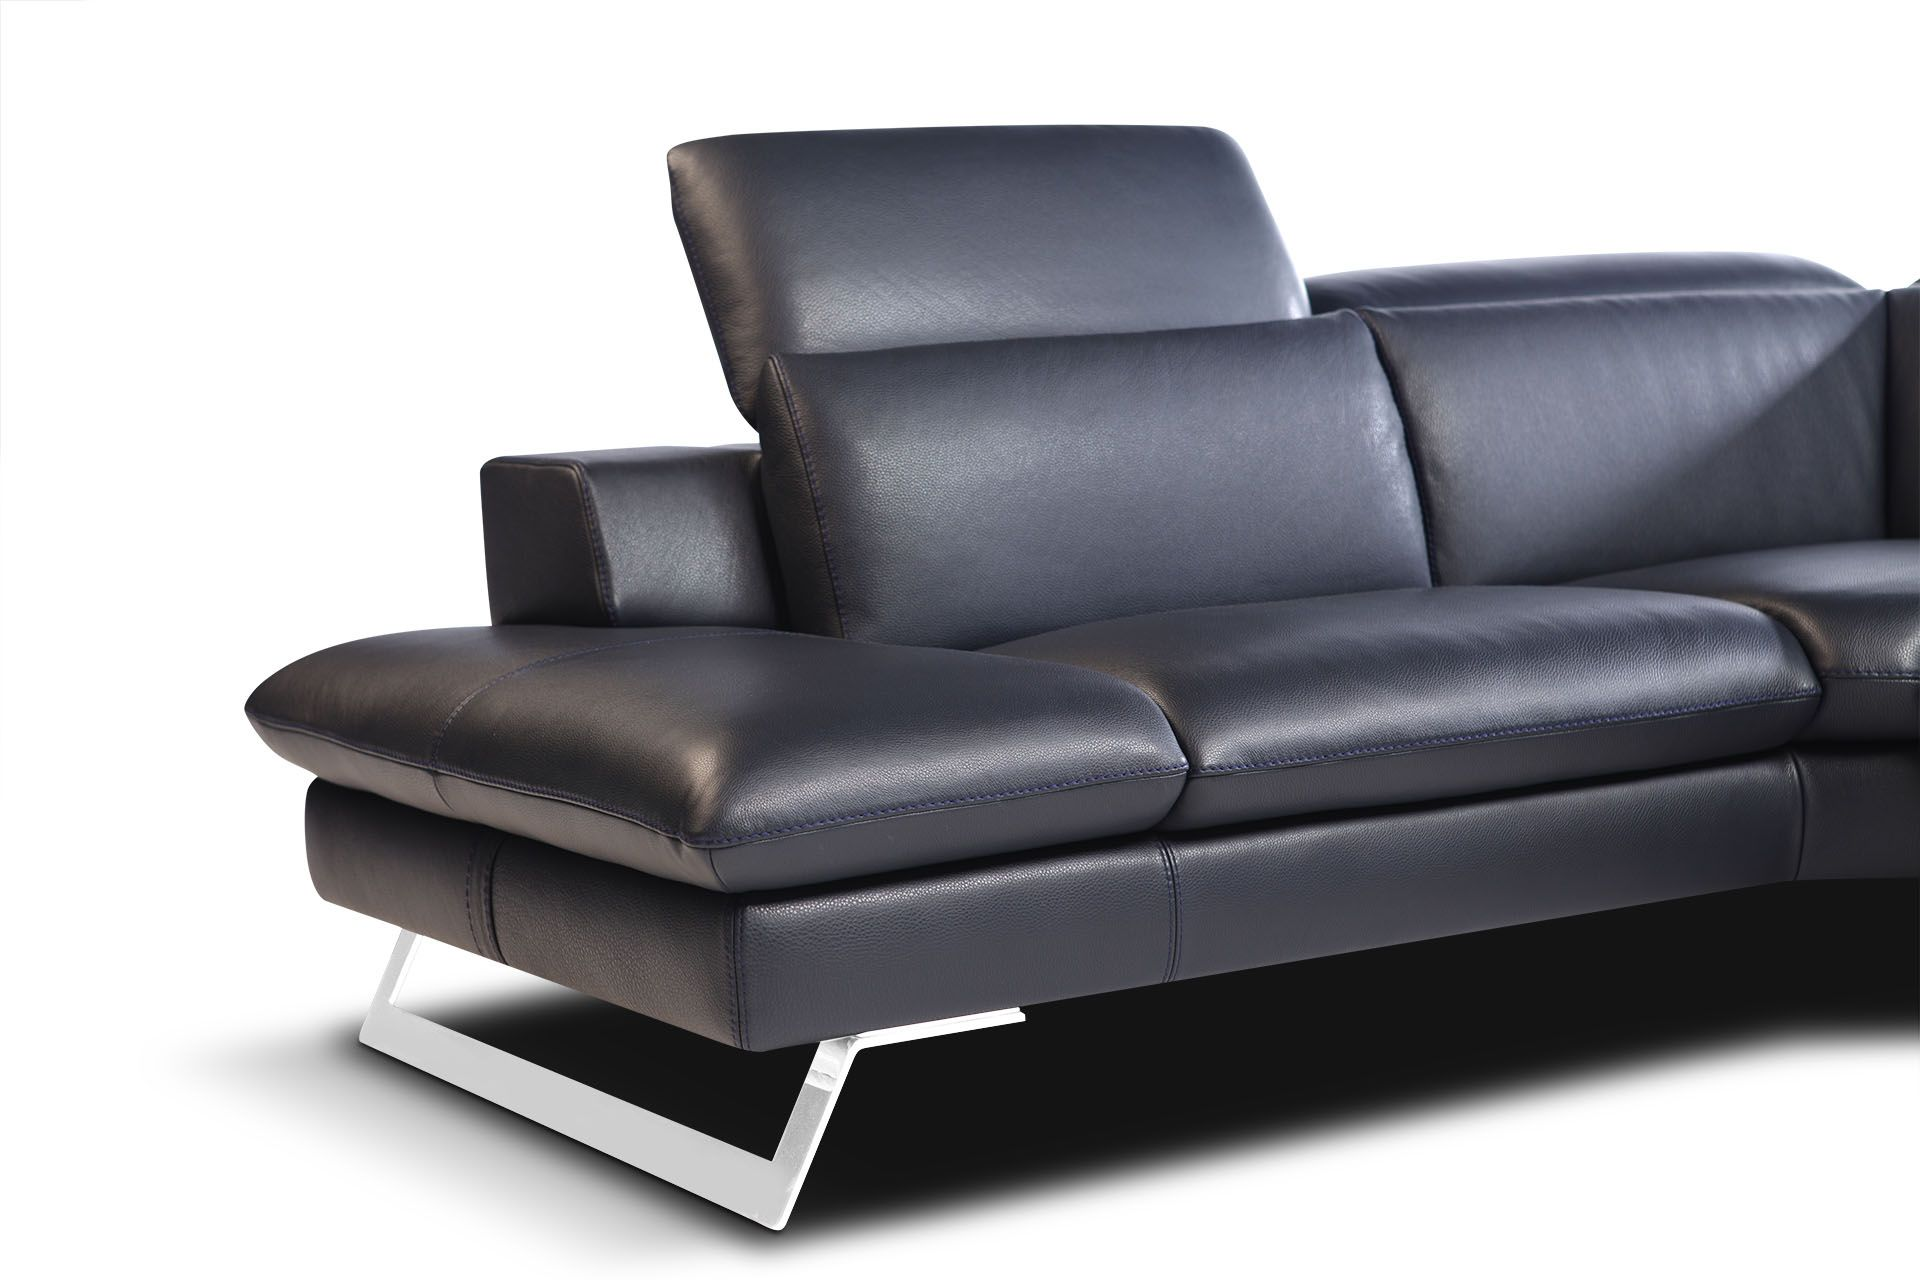 Nicoletti Lipari Grey Italian Leather Sofa Chaise Microfiber Uk Gradschoolfairs